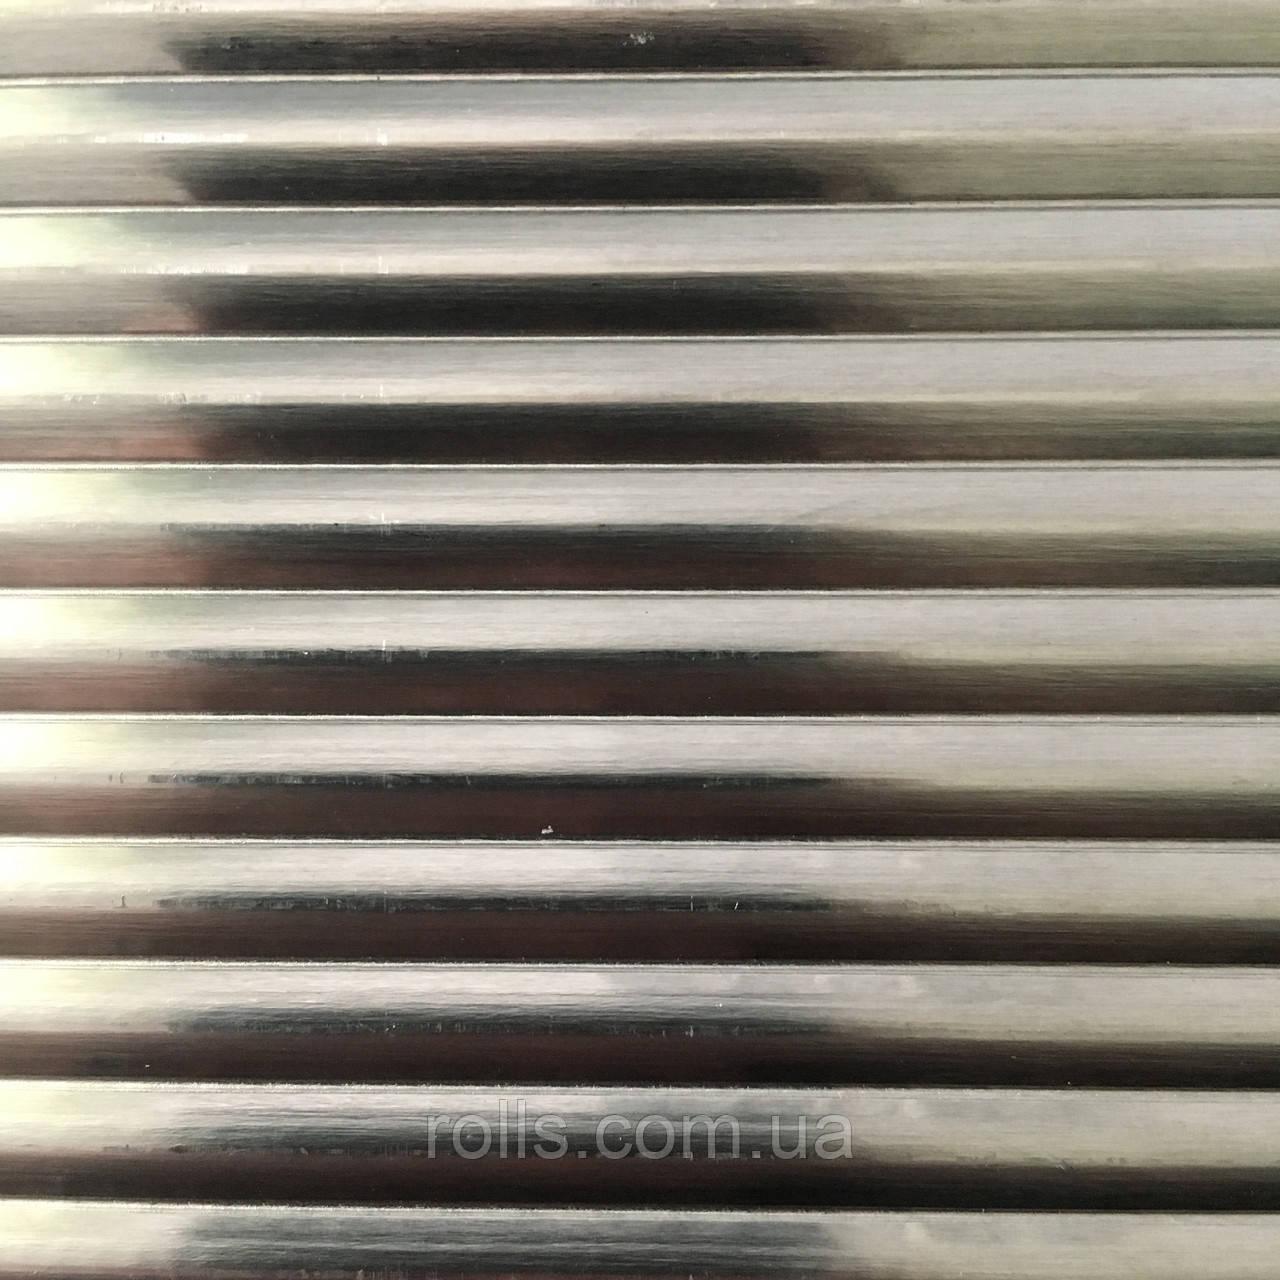 Лист рифленый алюминиевый 1,0х1000х3000мм PREFA DESIGN 916 Wave lengthwise 5mm